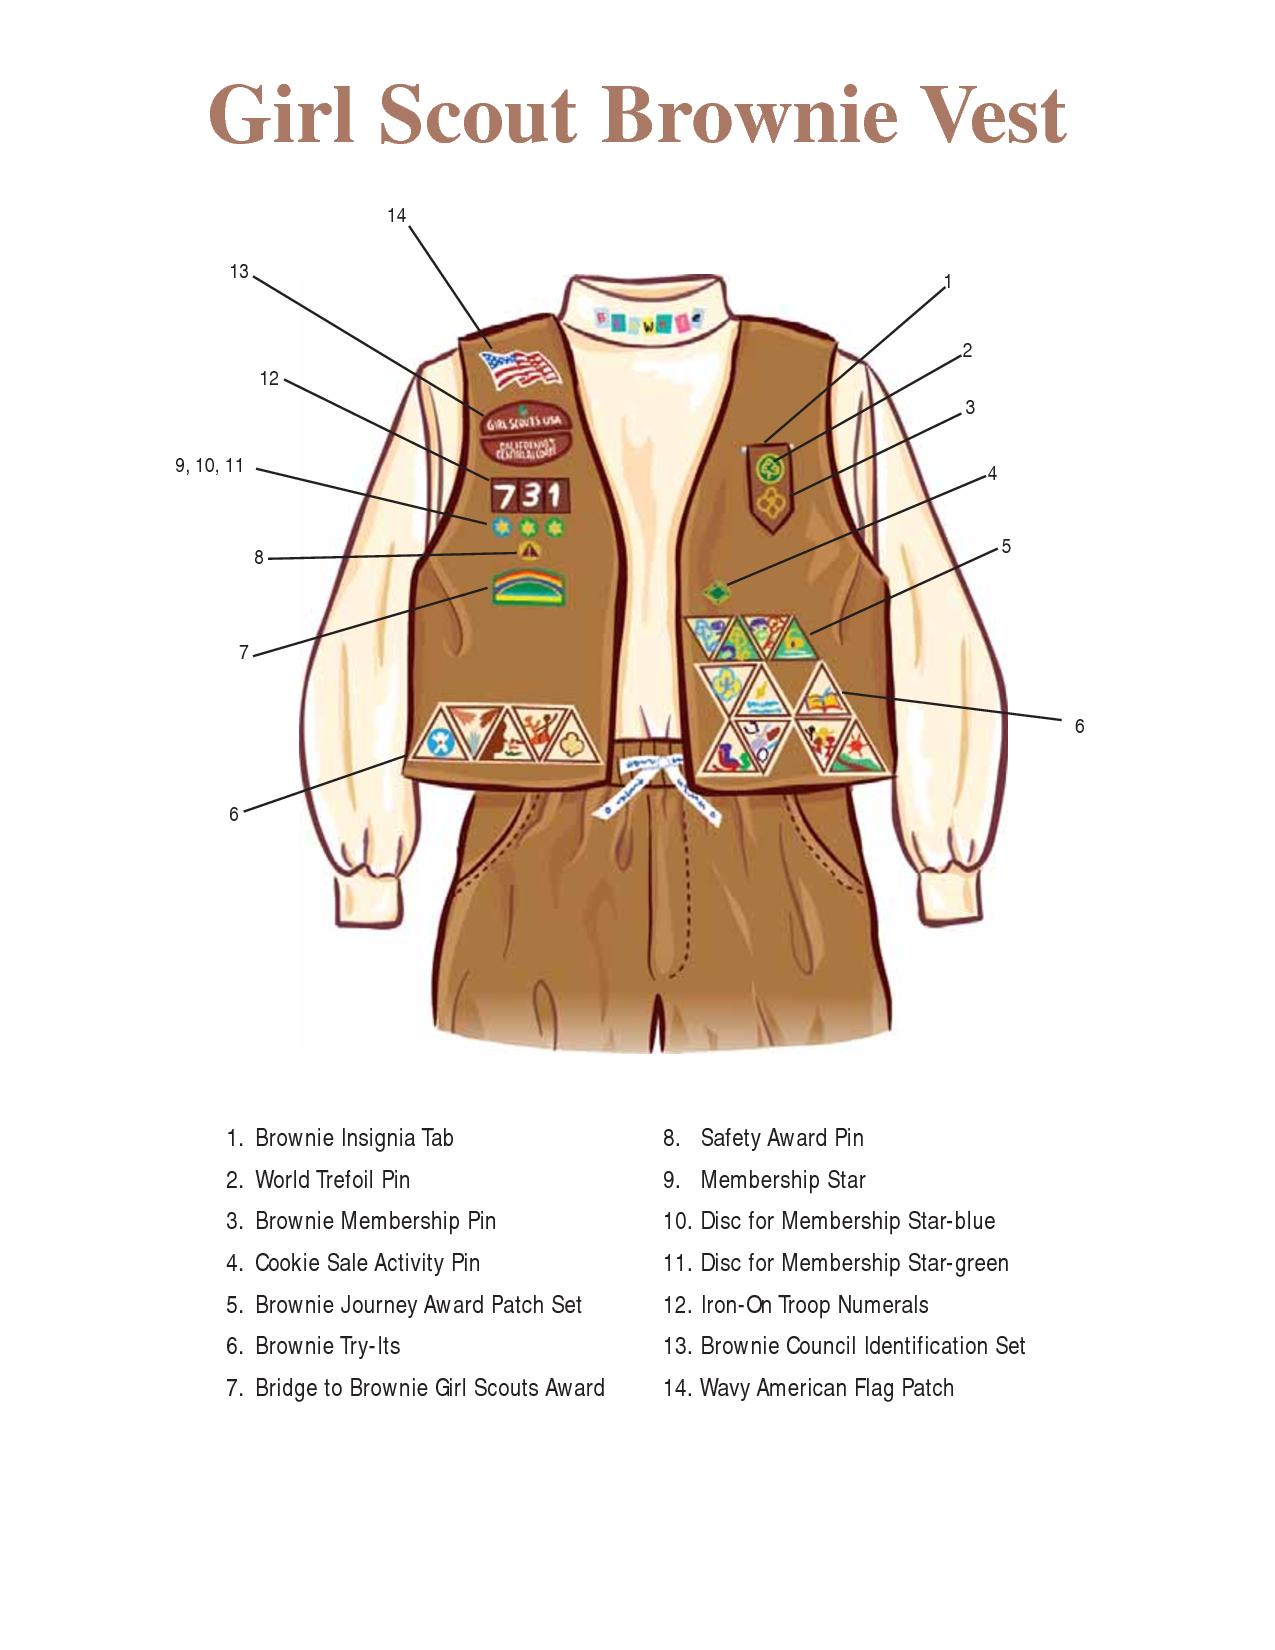 Worksheet Brownie Vests brownie vest layout girl scouts pinterest brownies and layout